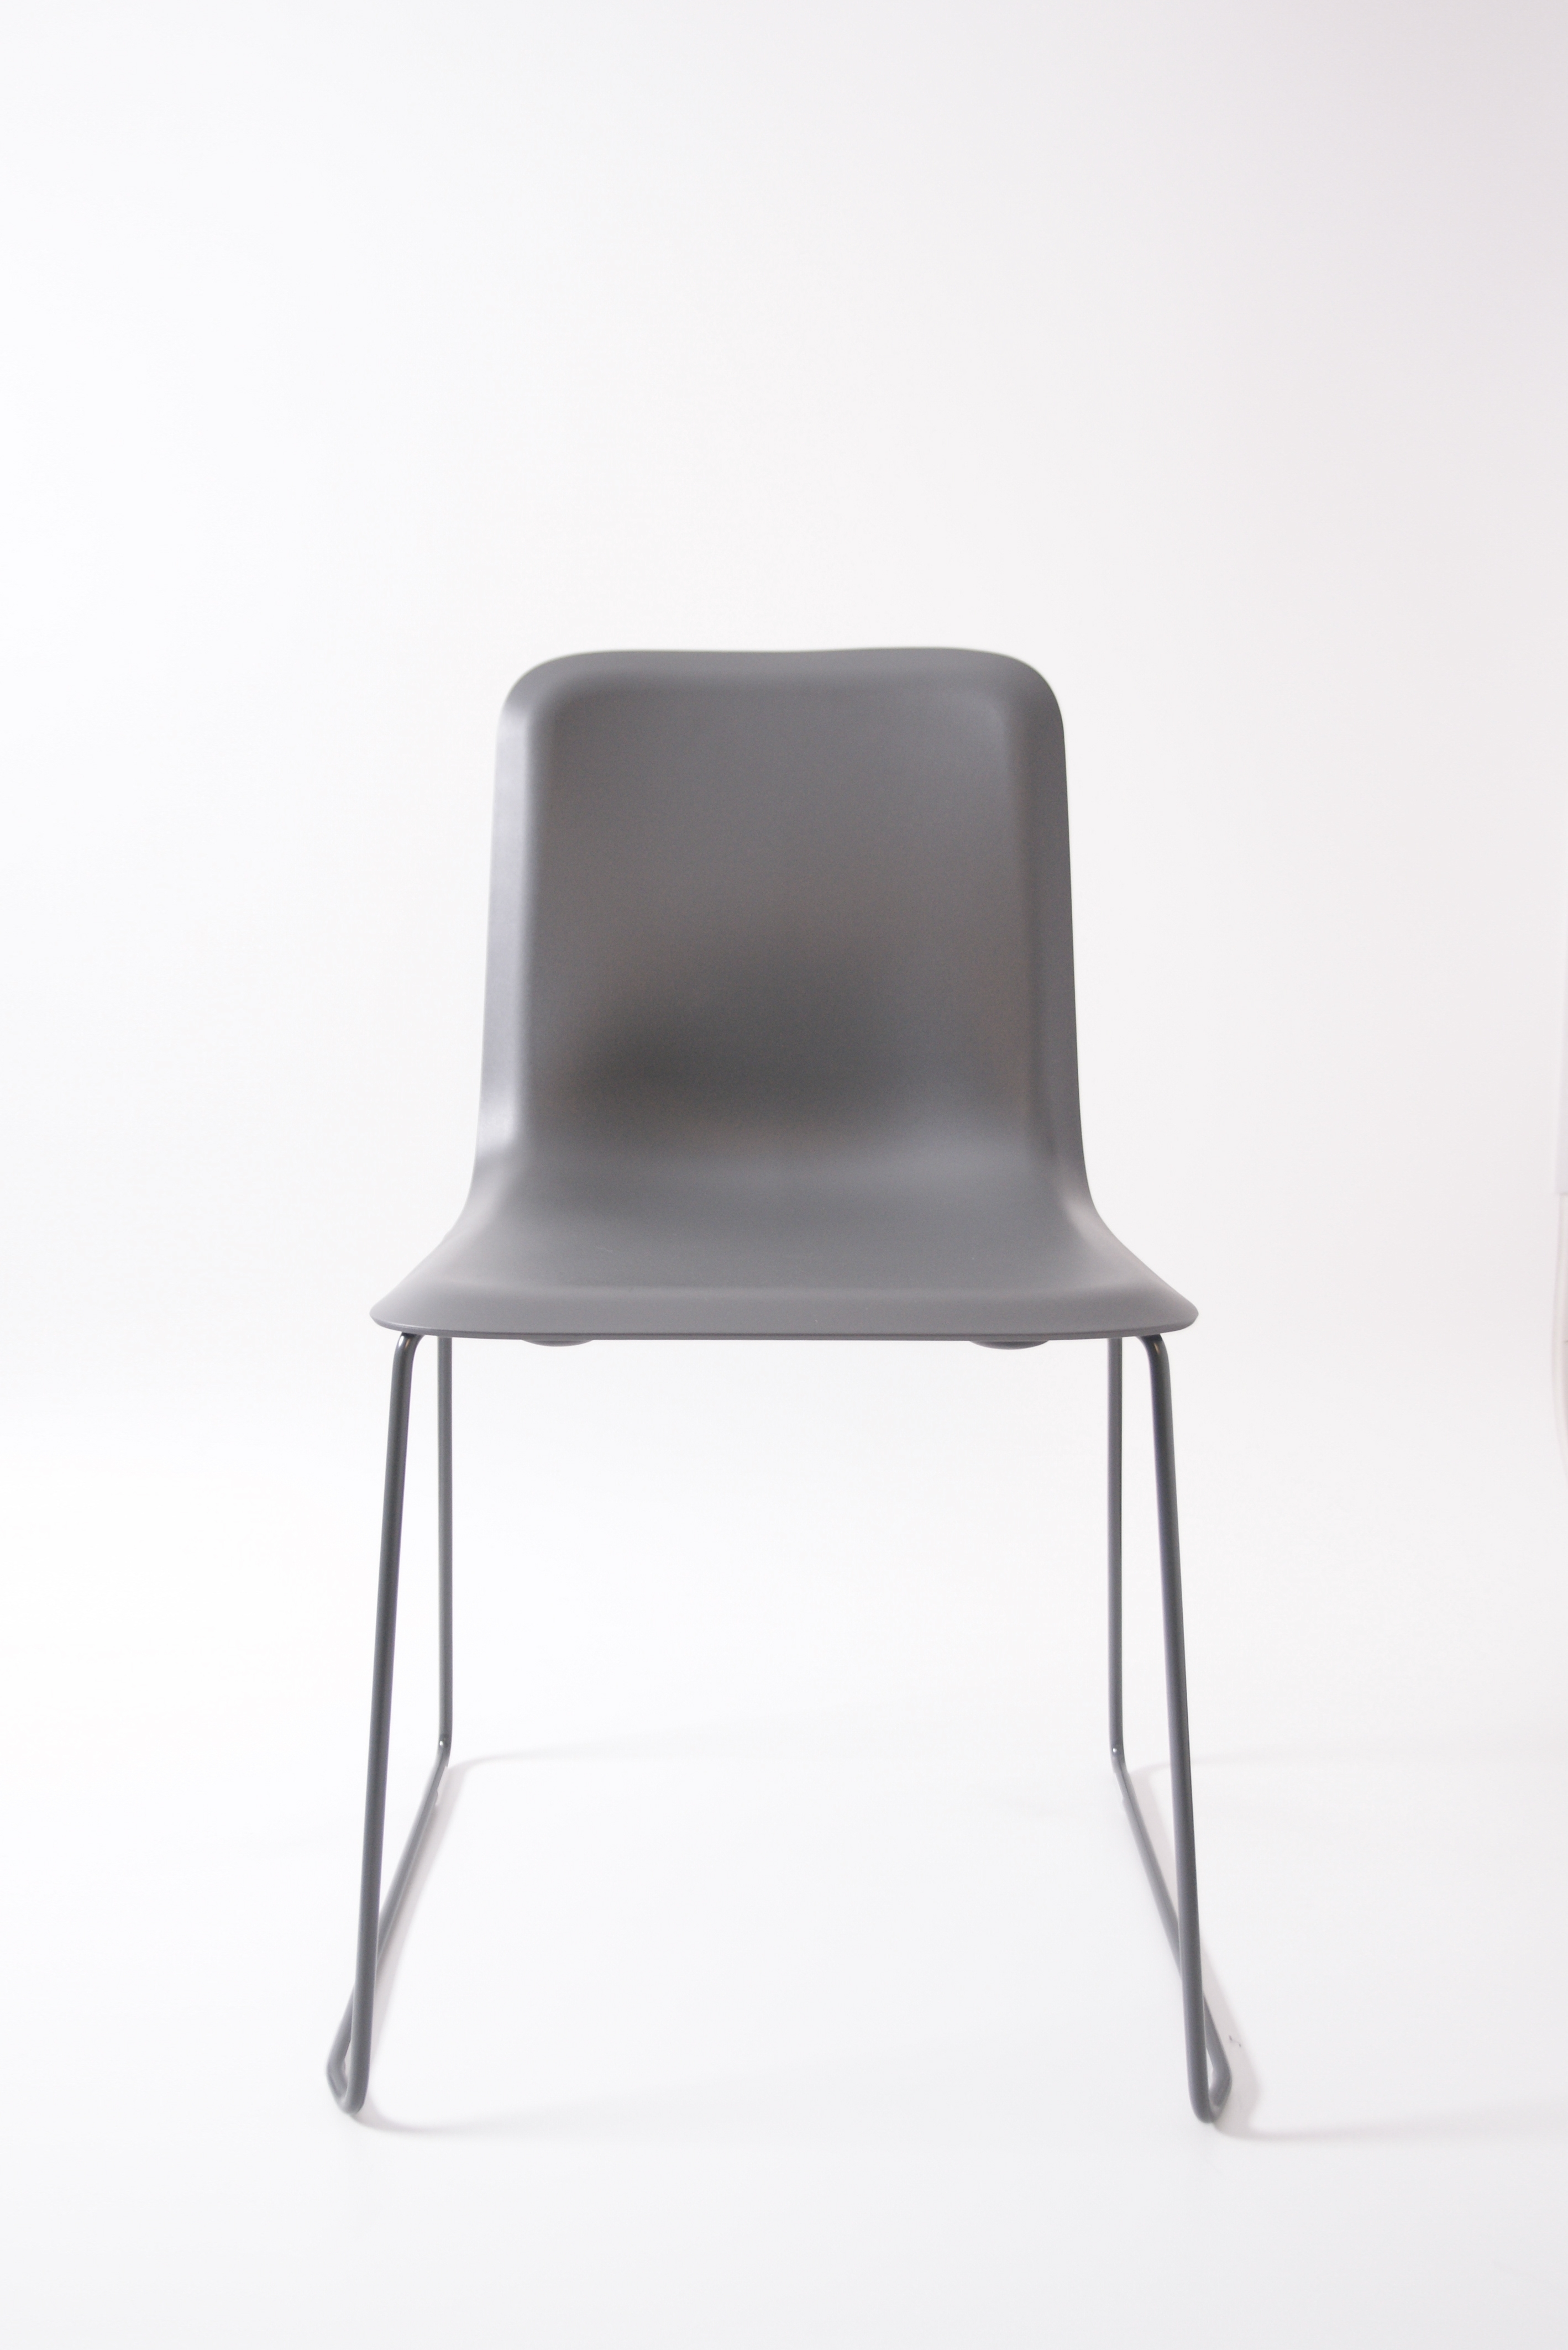 That Chair Grijs Front